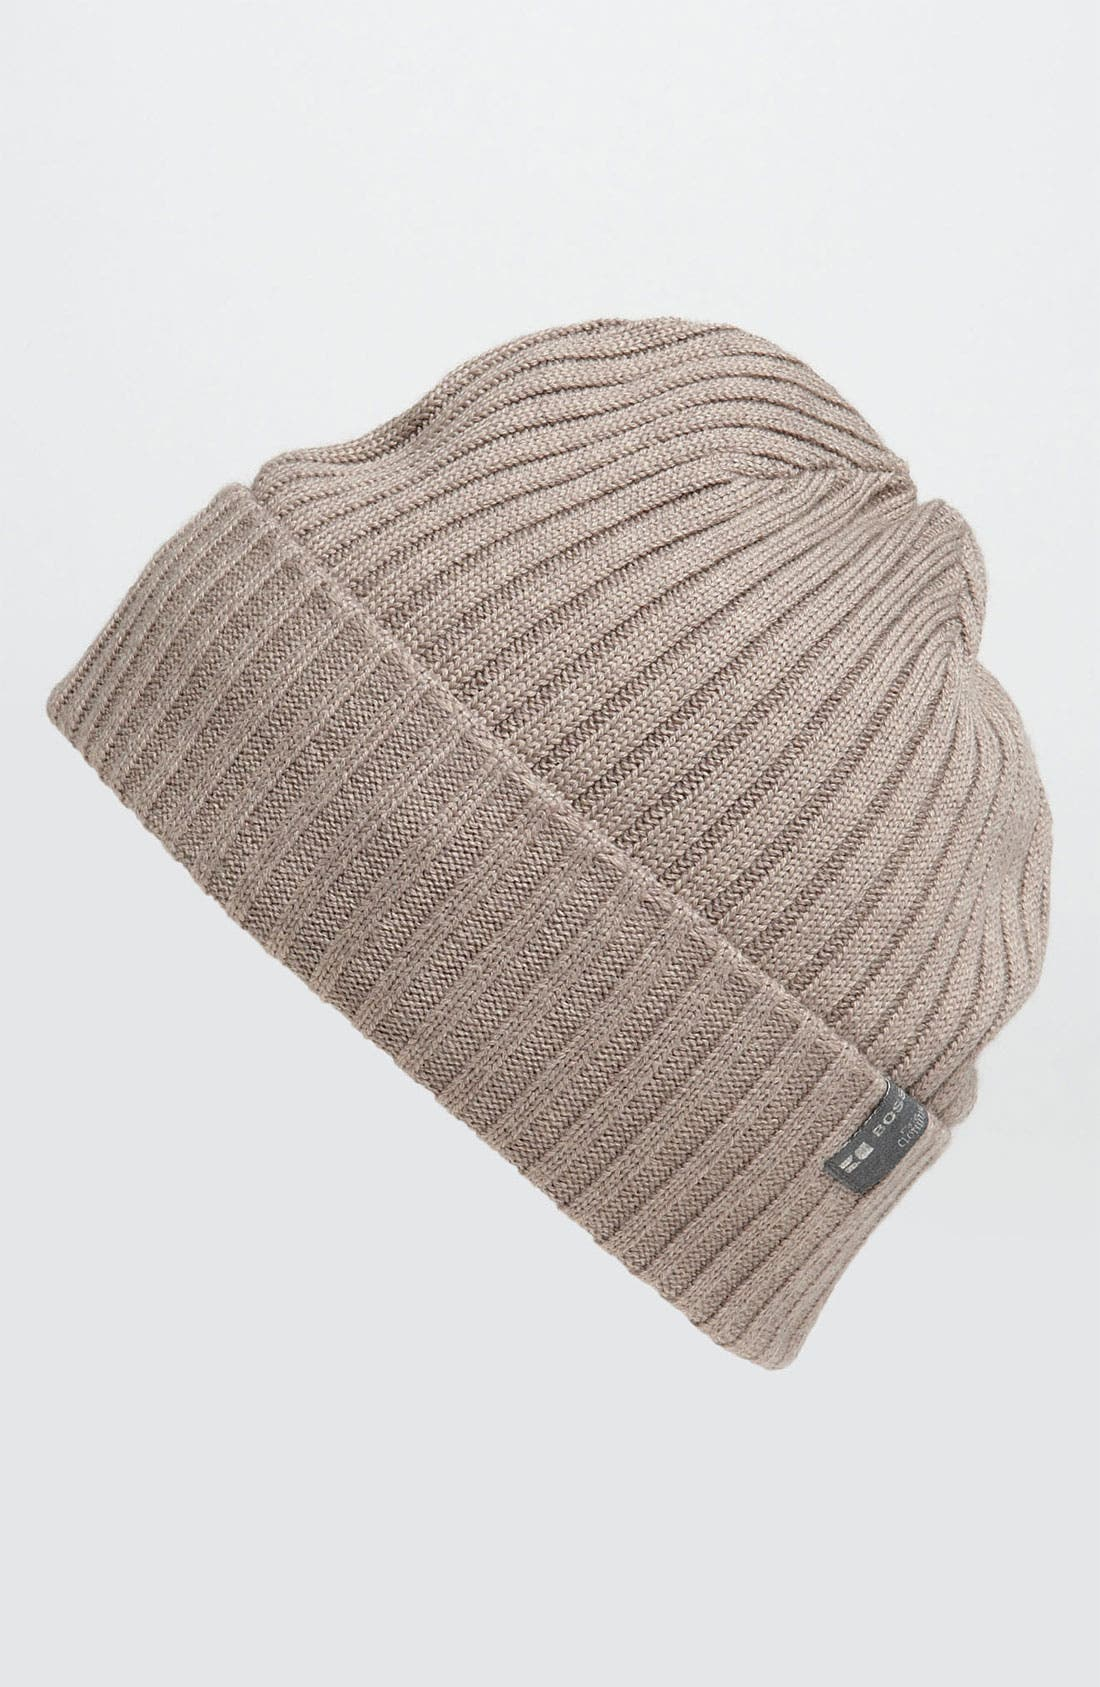 Main Image - BOSS Orange Wool Blend Knit Cap